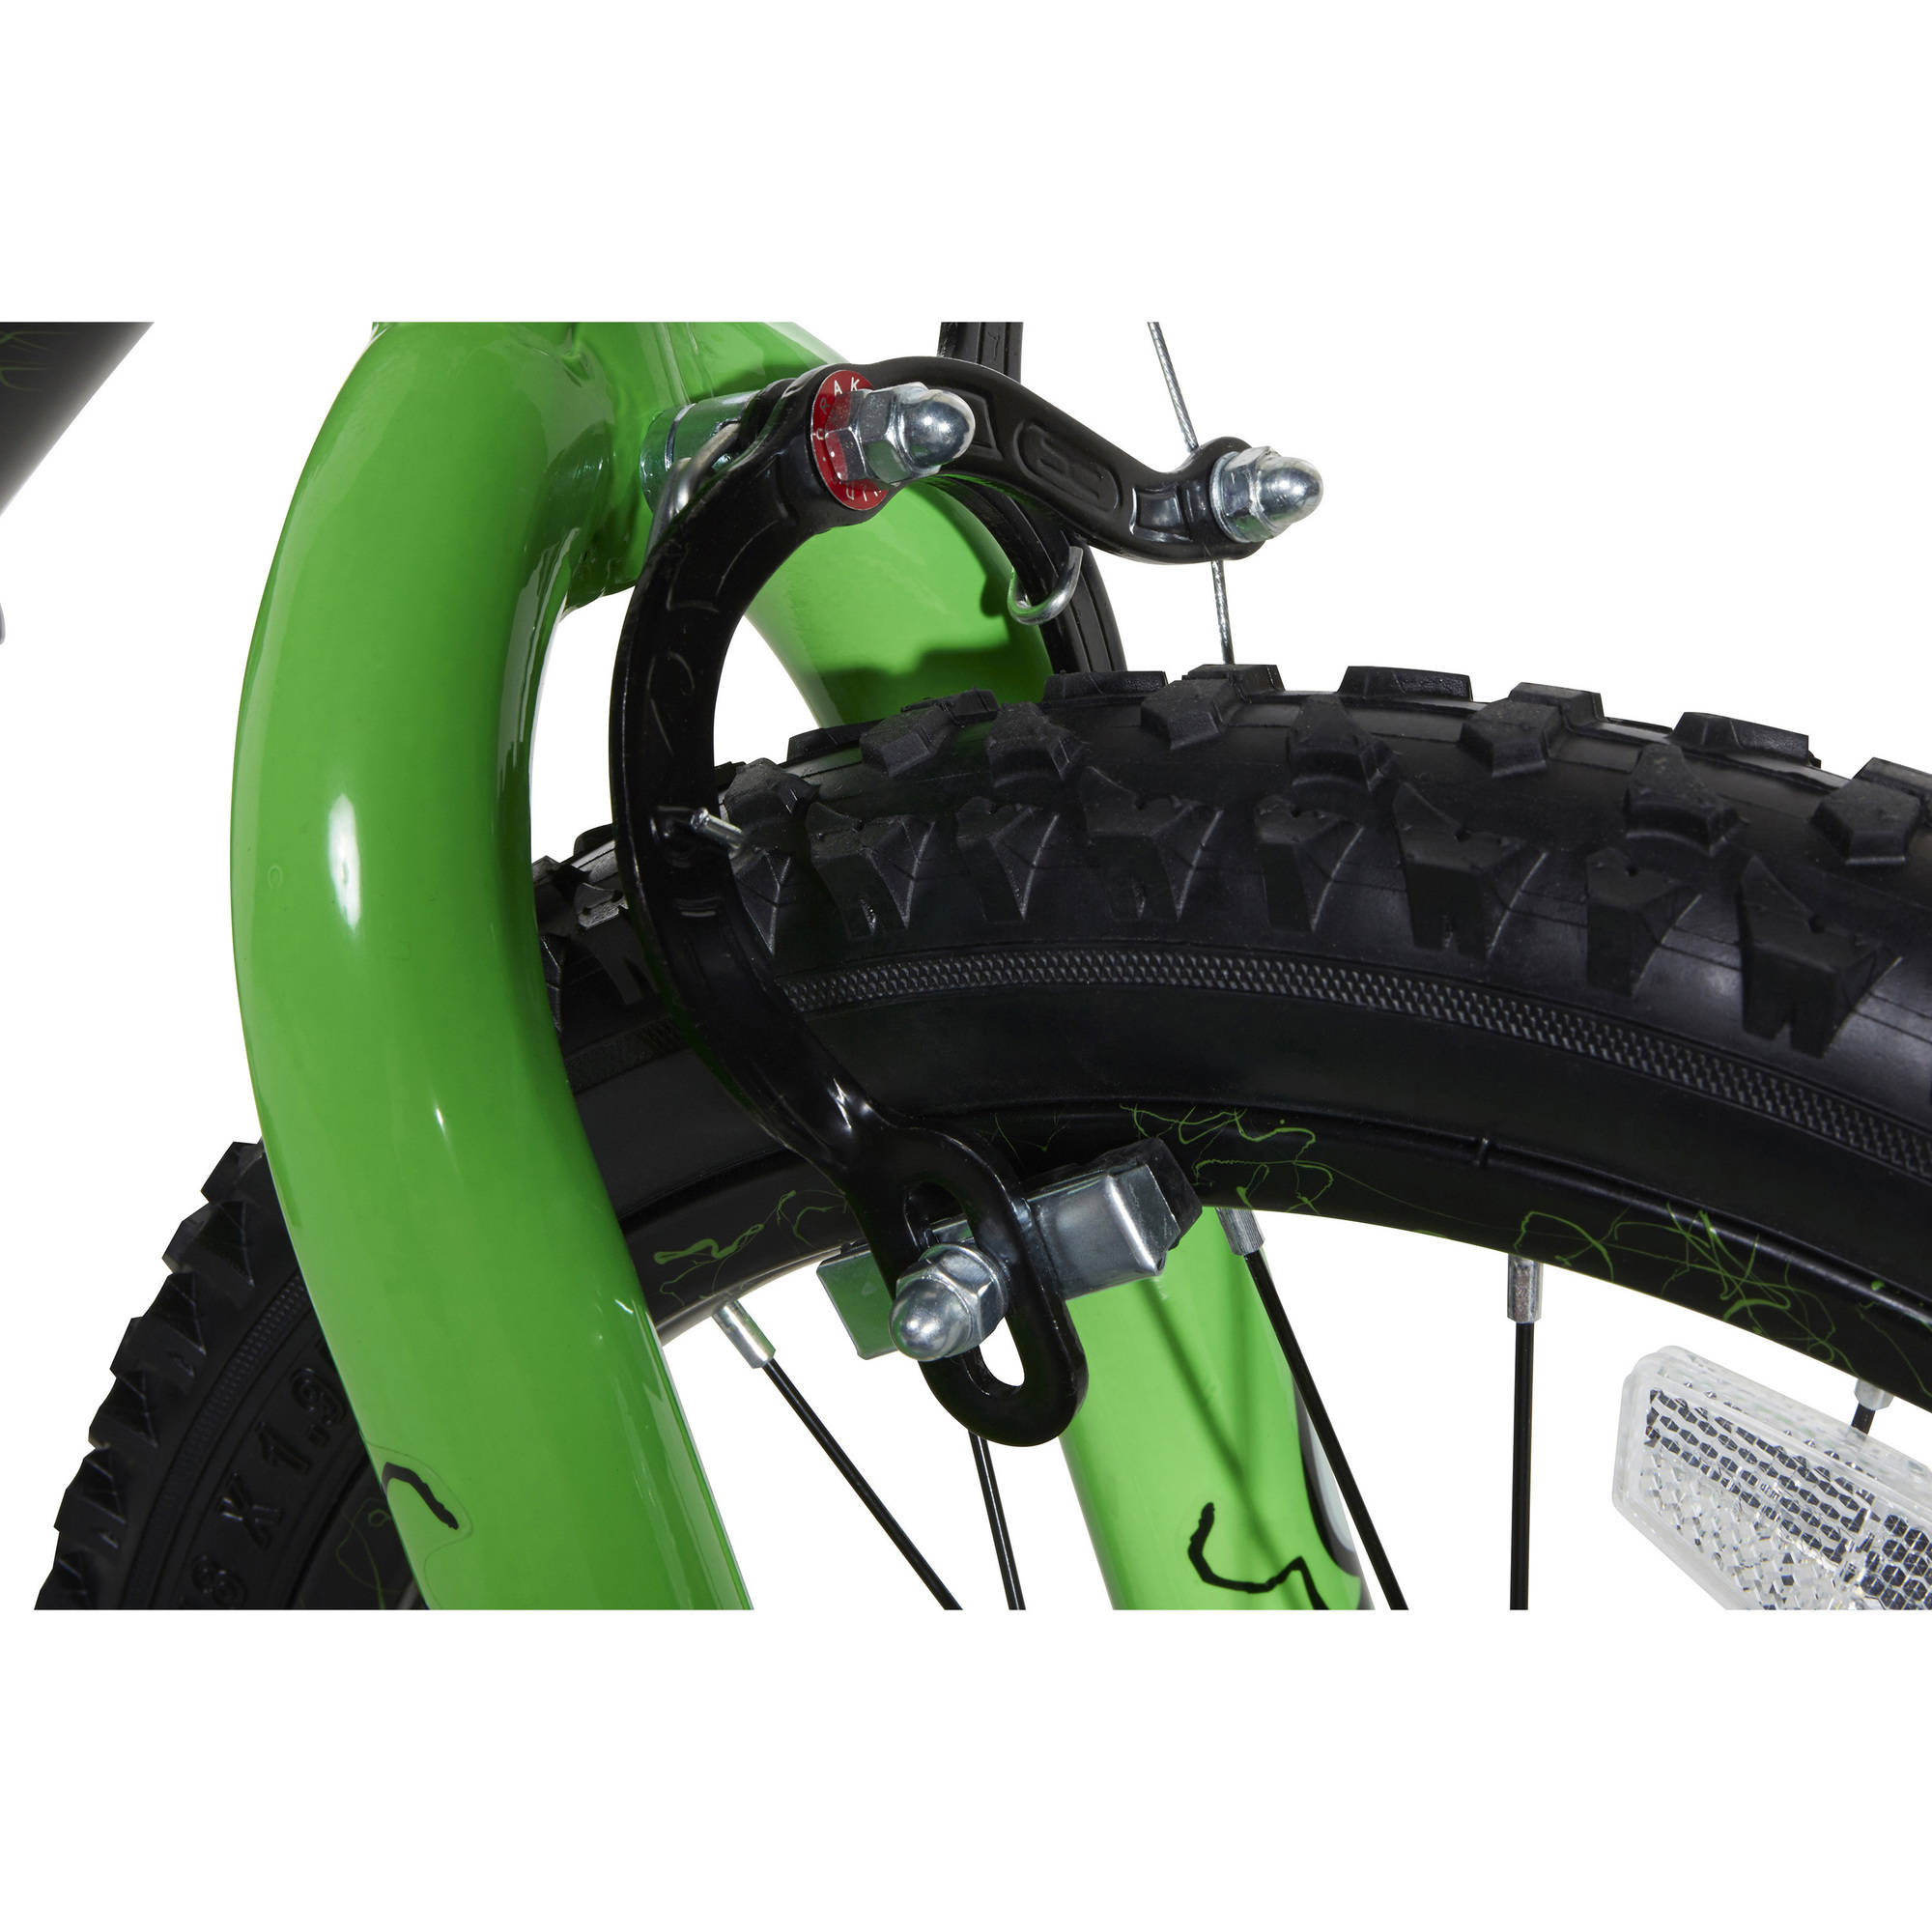 2x Black Tyre 18 x 2.0 52-355 Kids Childs Bicycle Bike